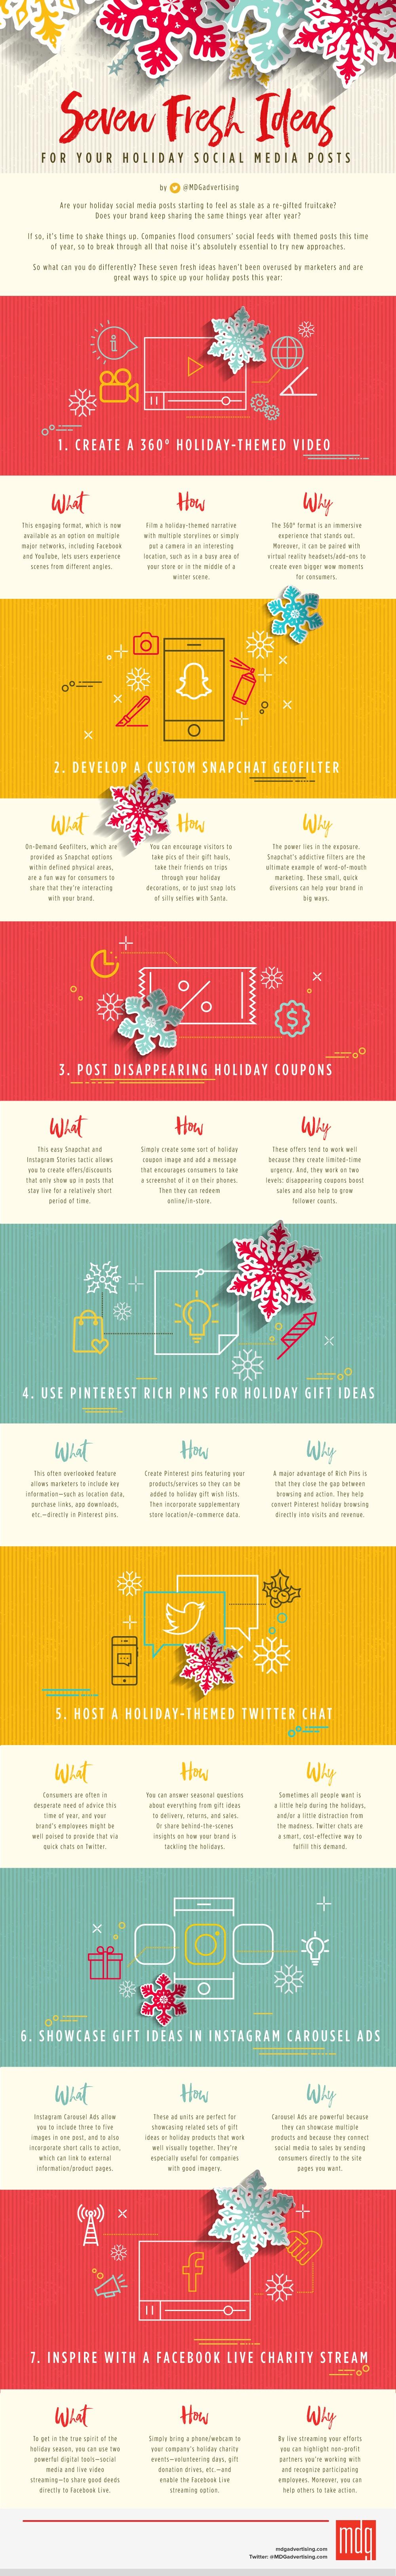 holiday social media posts - infographic.jpg